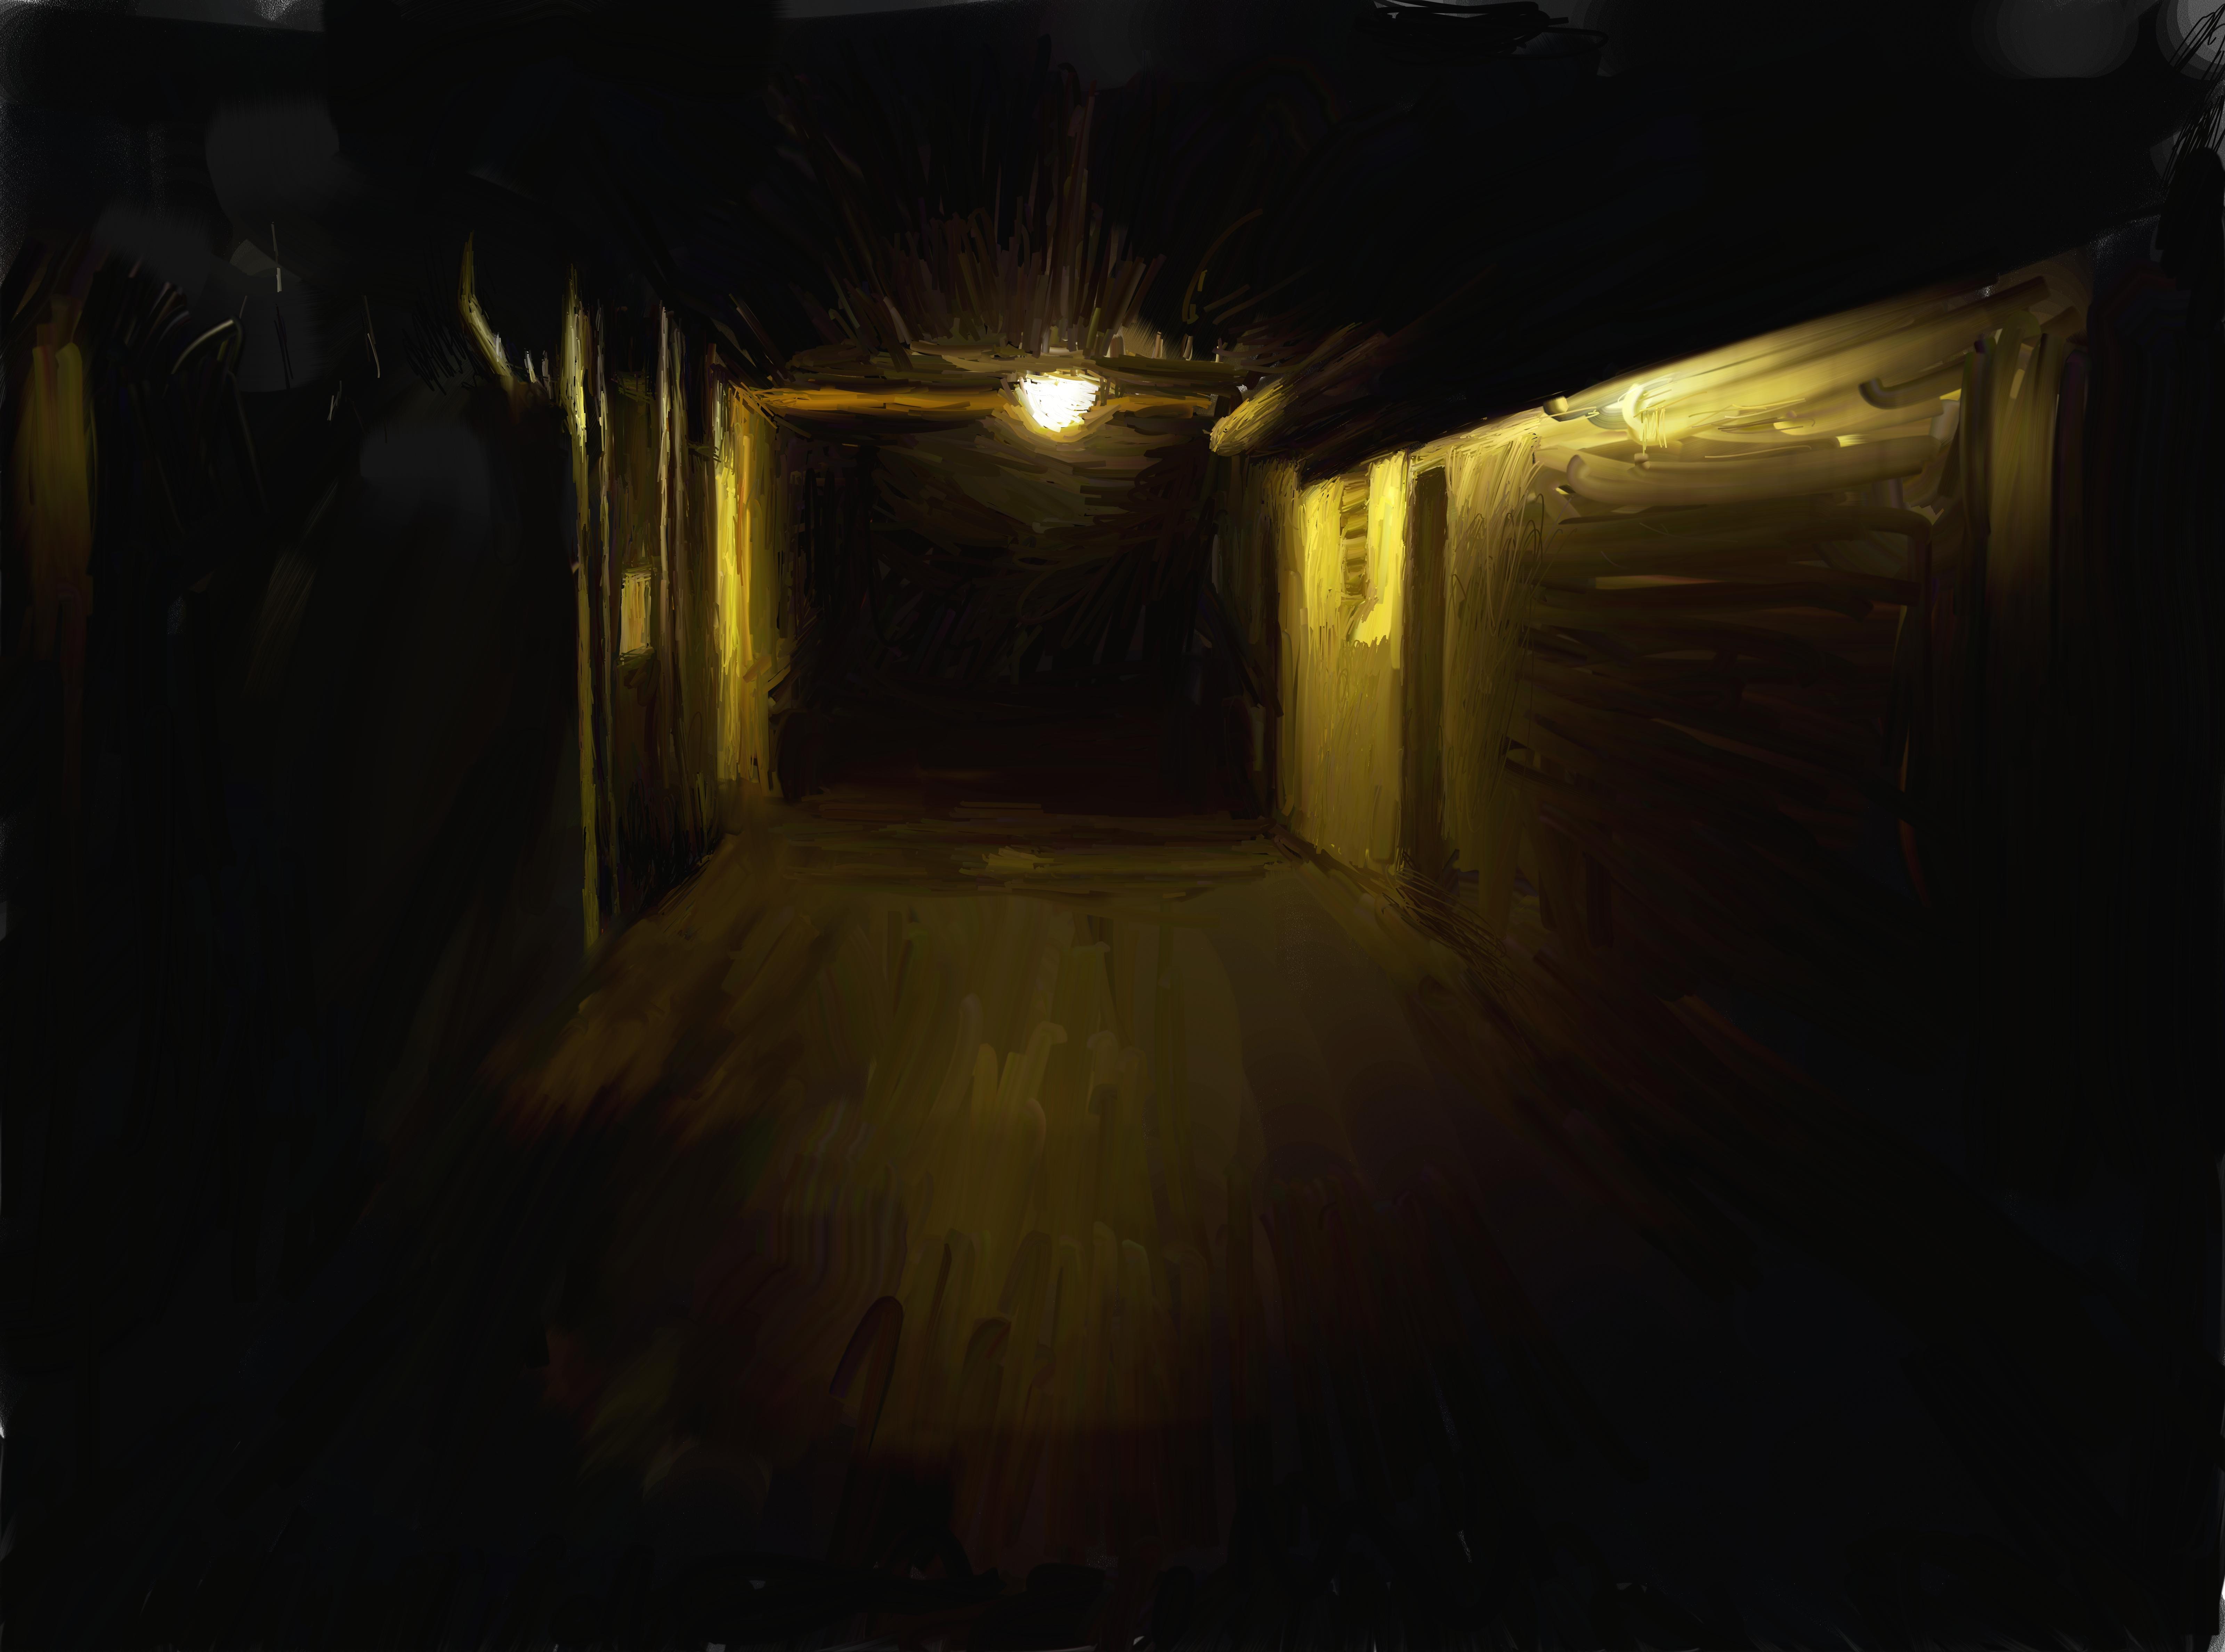 Dark Hallway By Darkwolf33333 Dark Hallway By Darkwolf33333